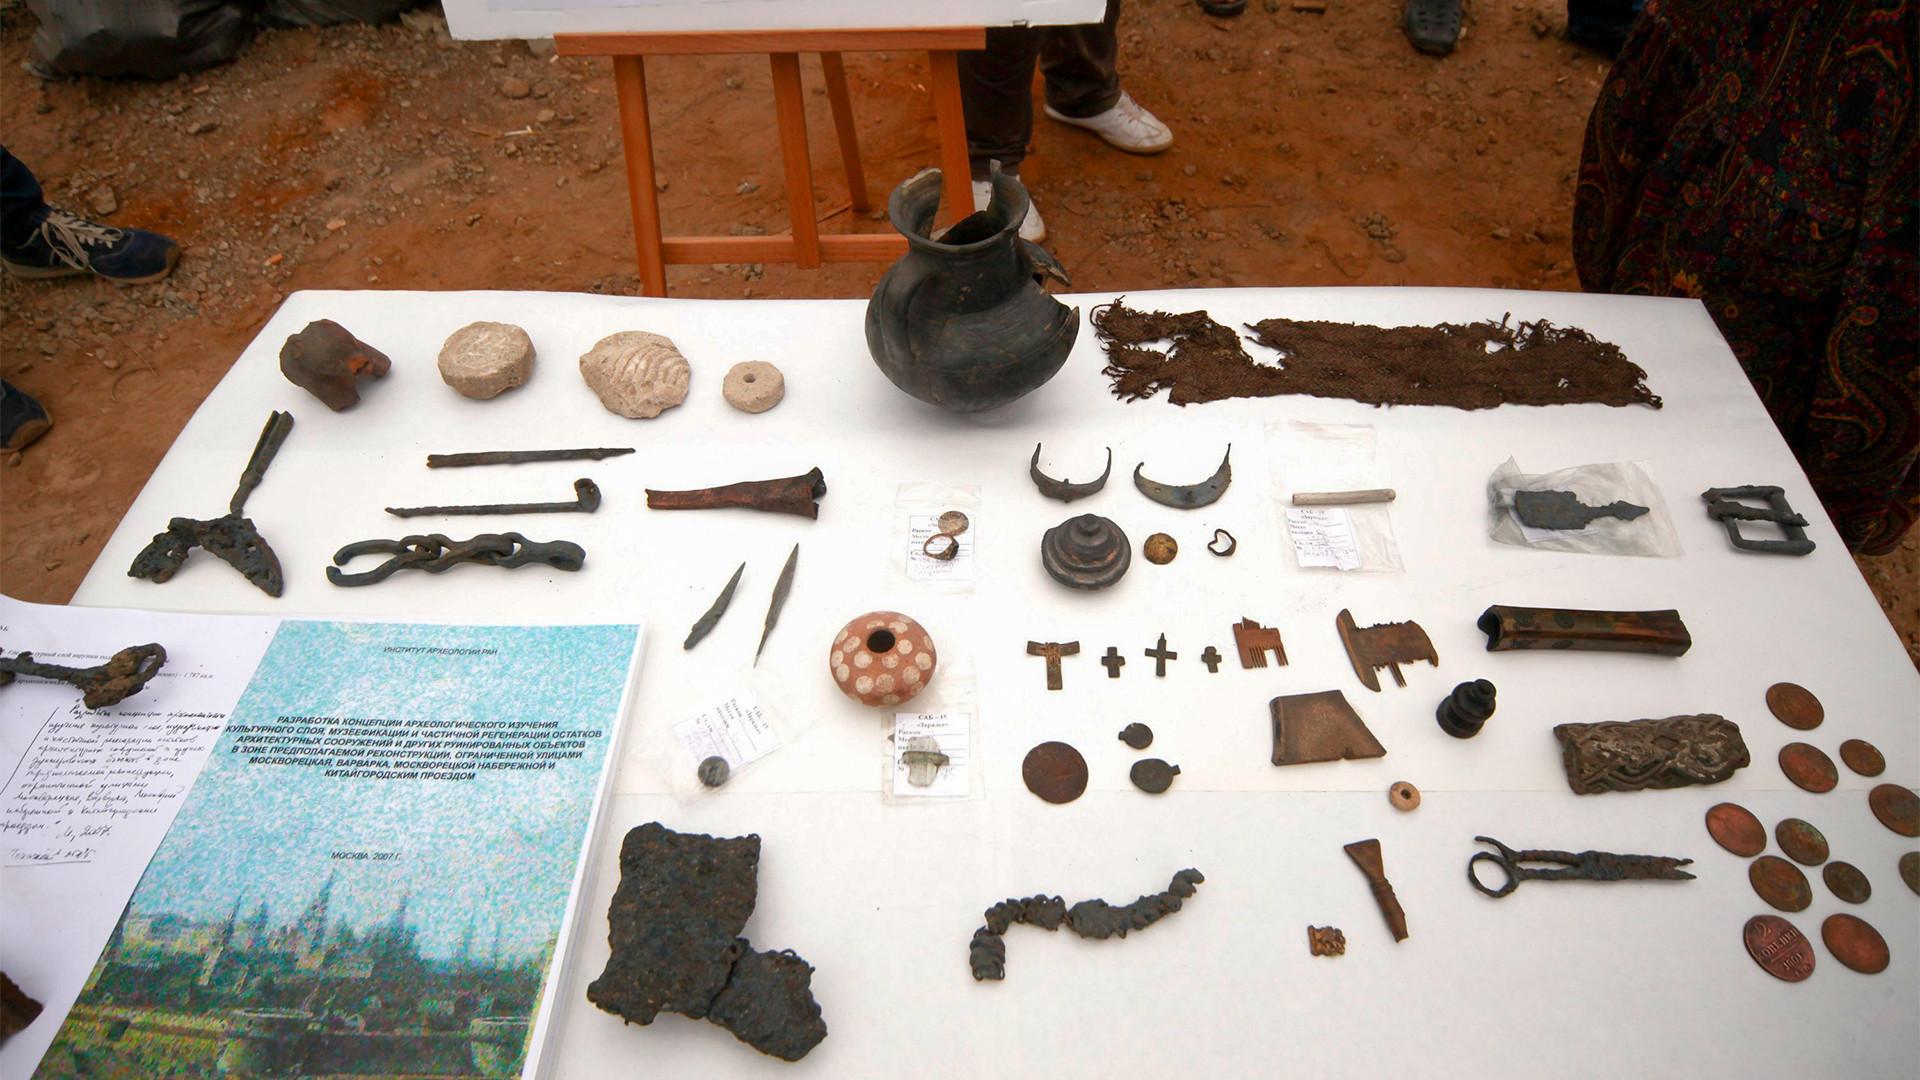 Arheološki artefakti, park Zarjadje, Moskva